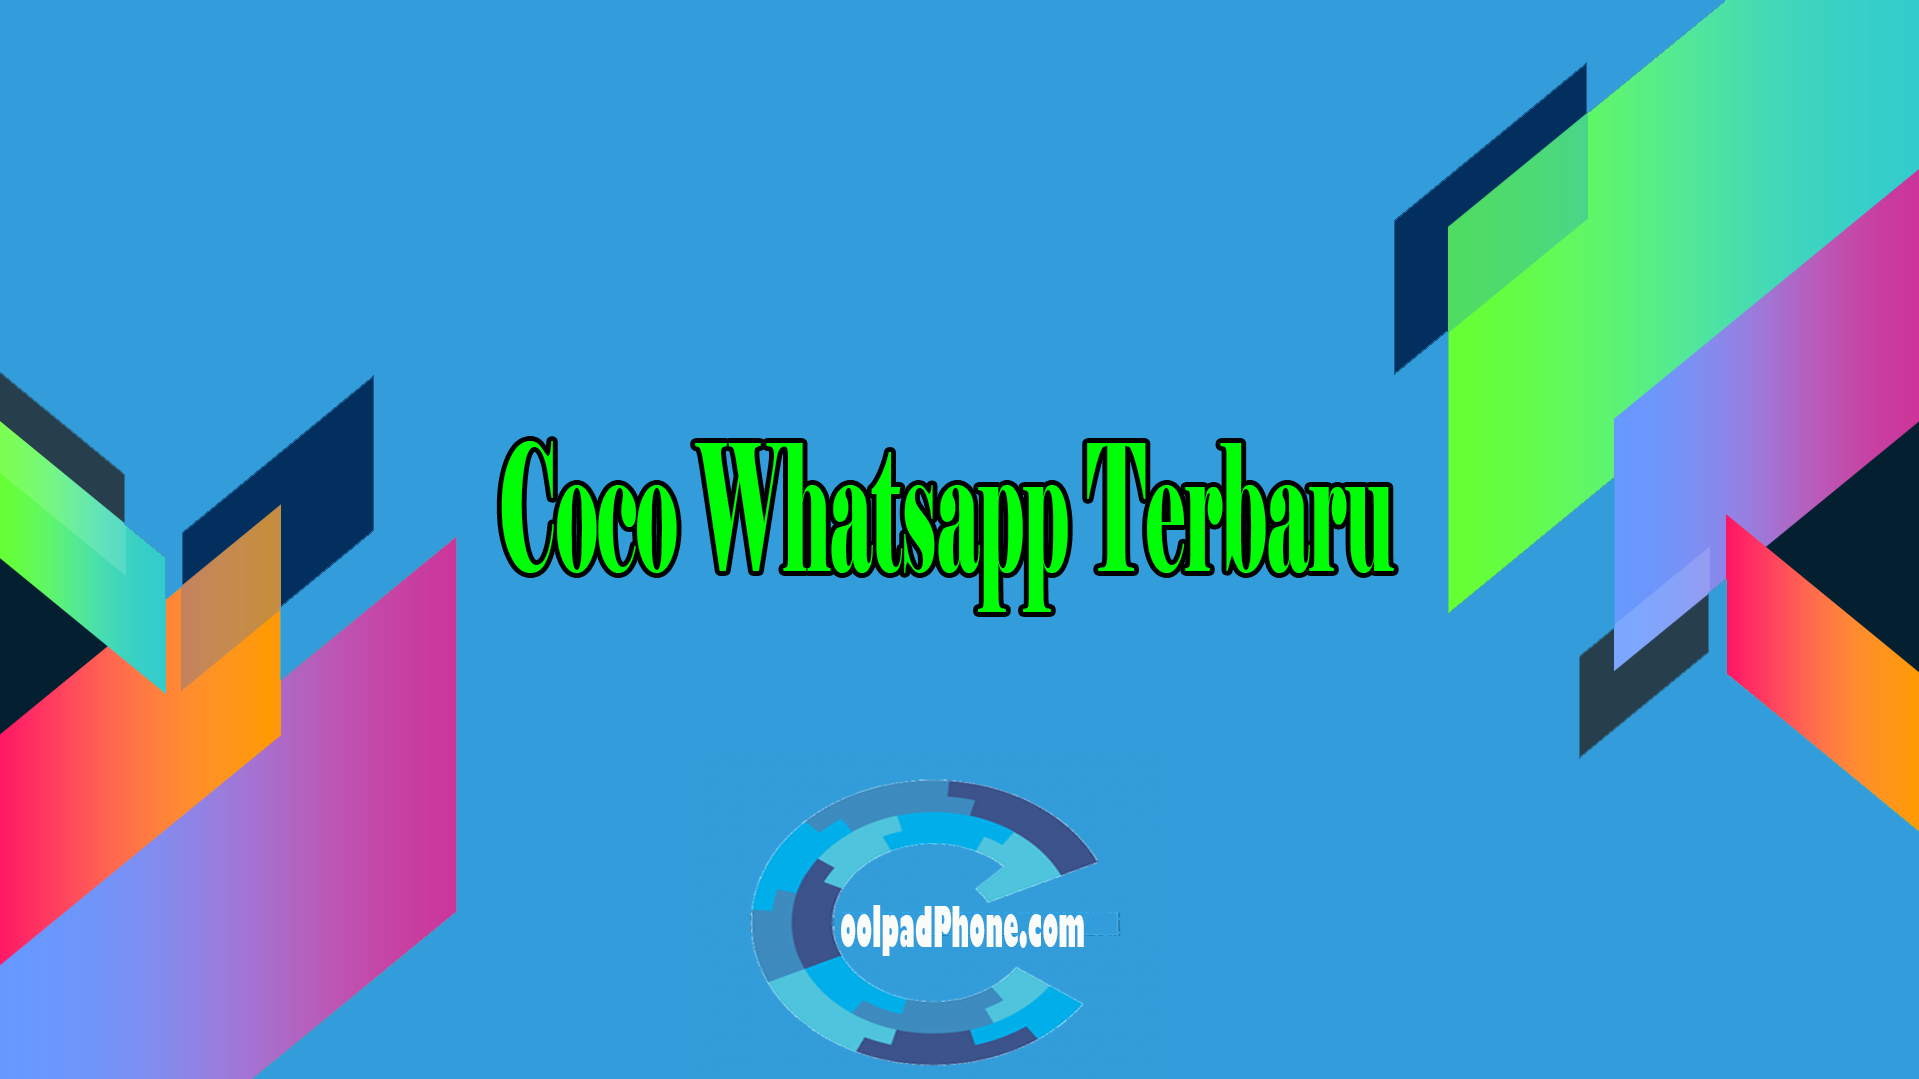 Coco Whatsapp Terbaru